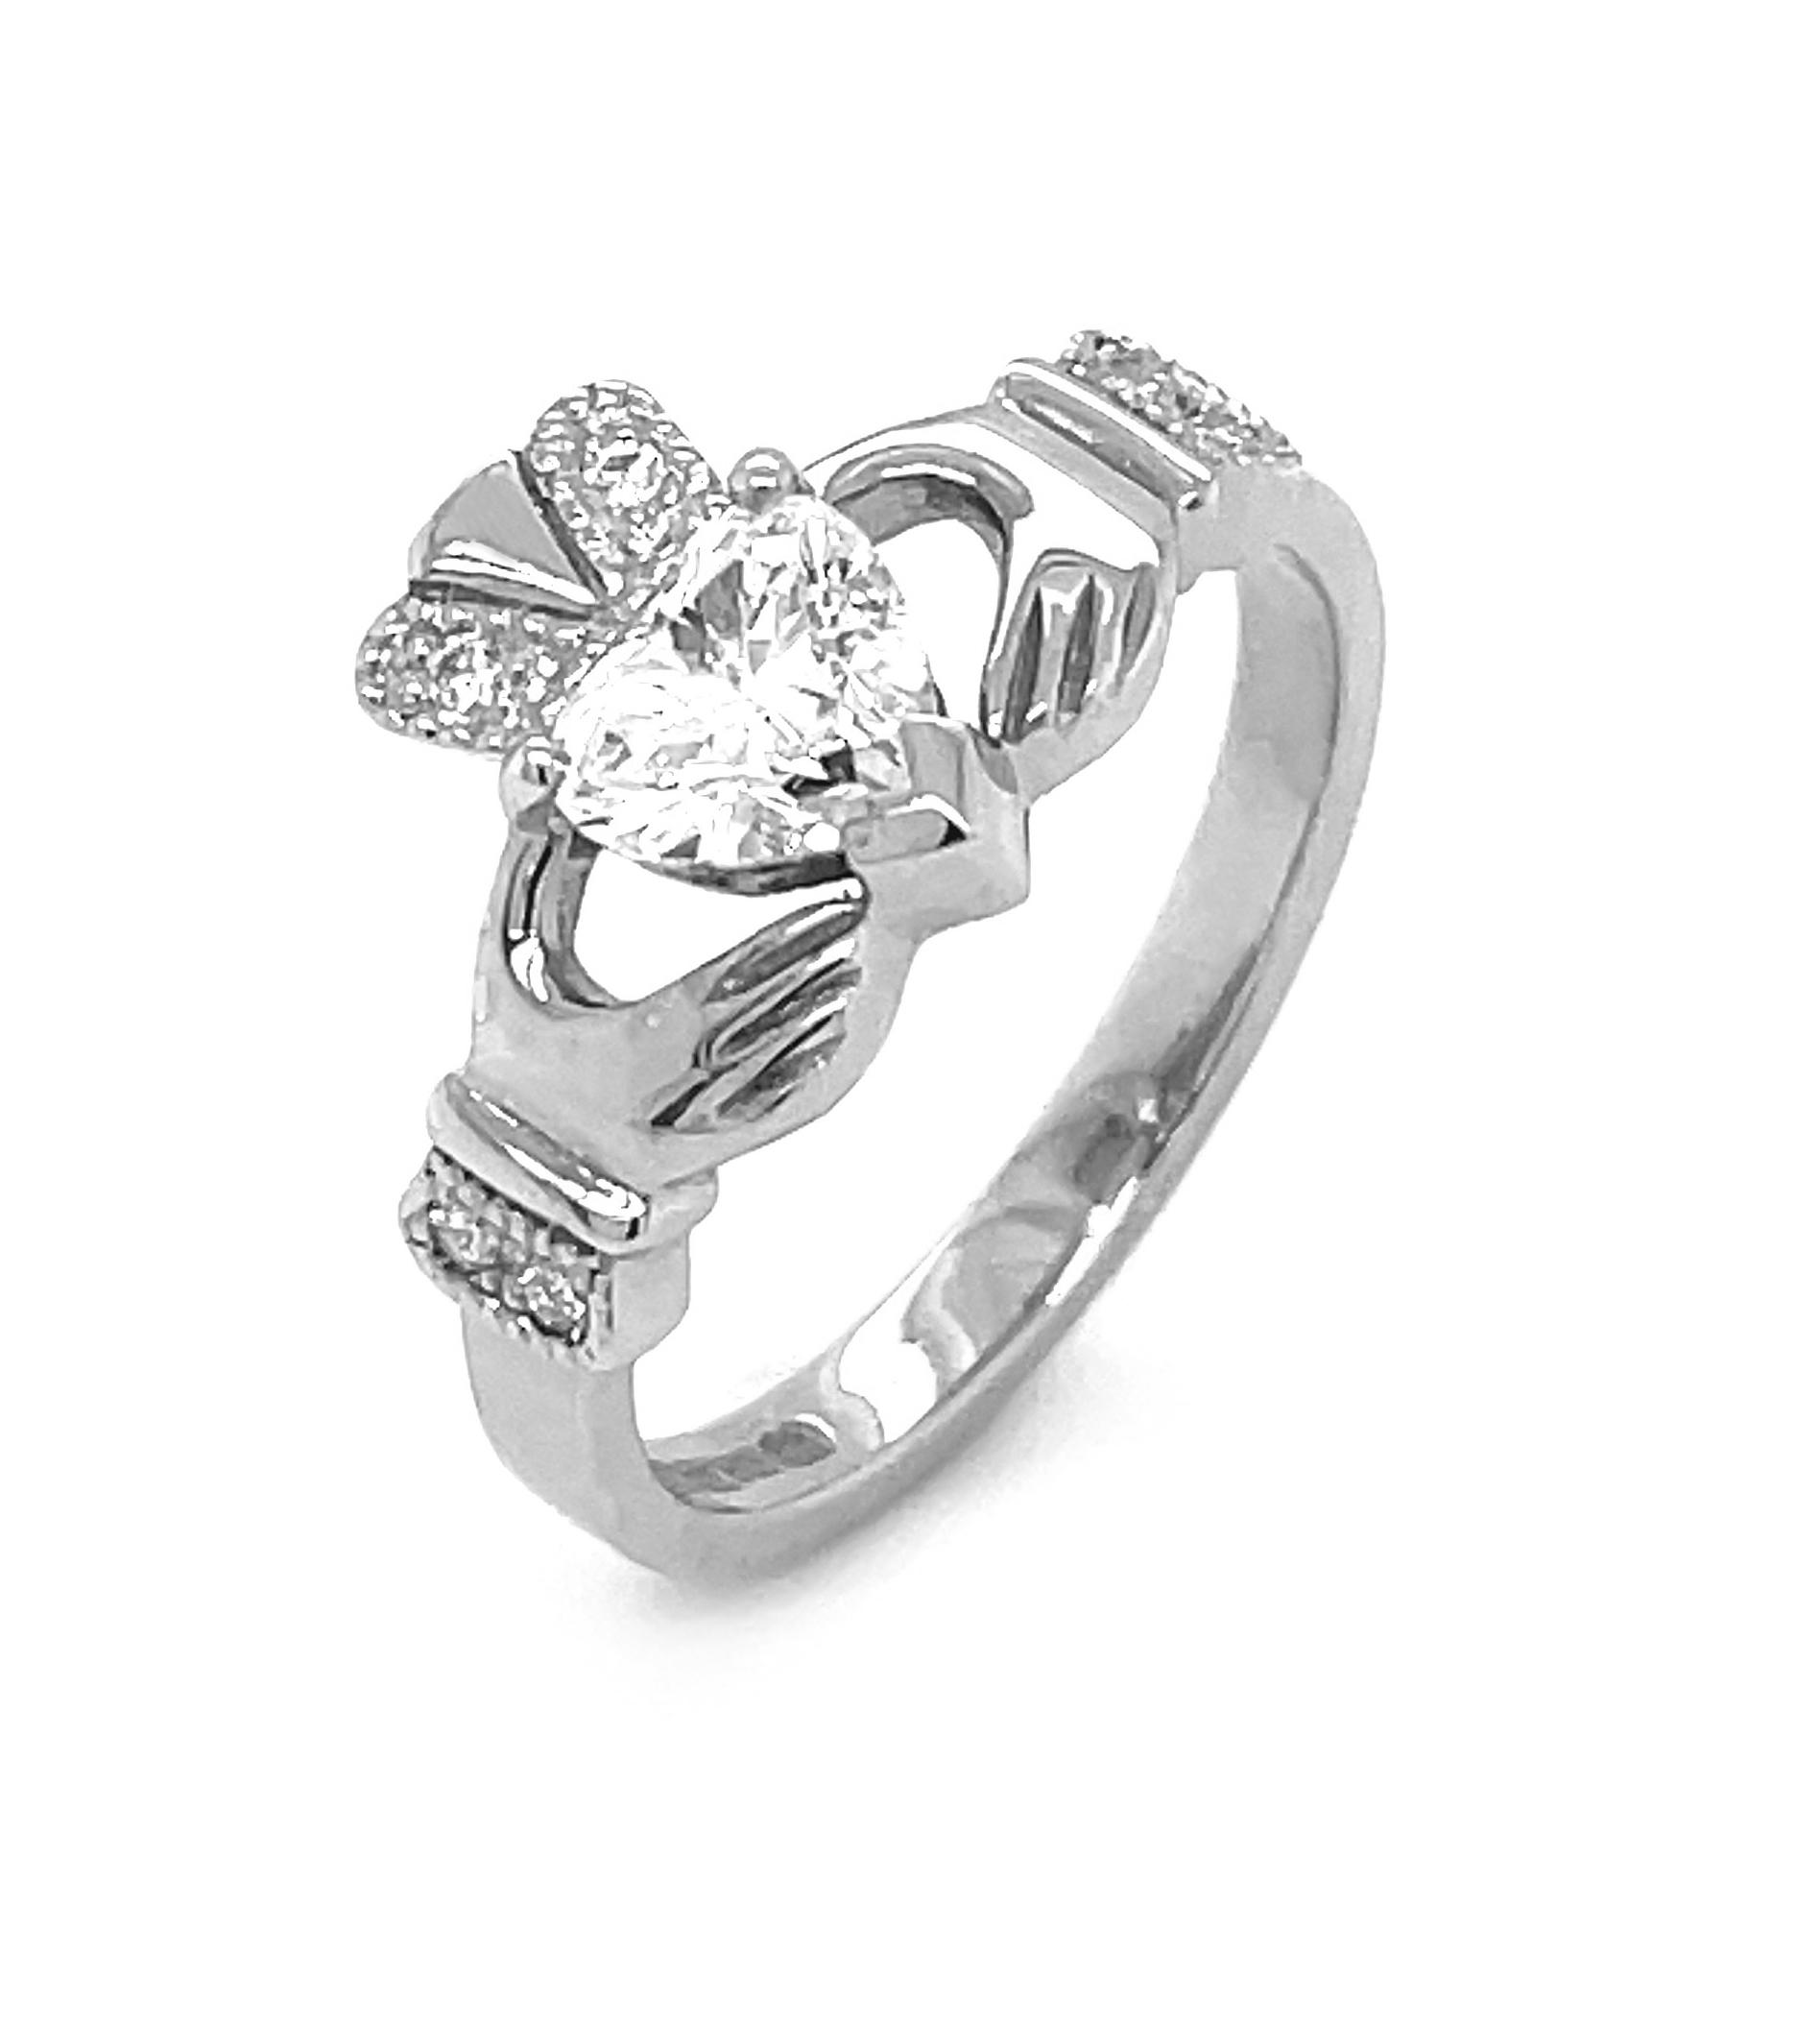 Full Heartshape 0.72cts DVS1 Diamond Claddagh Engagement Ring